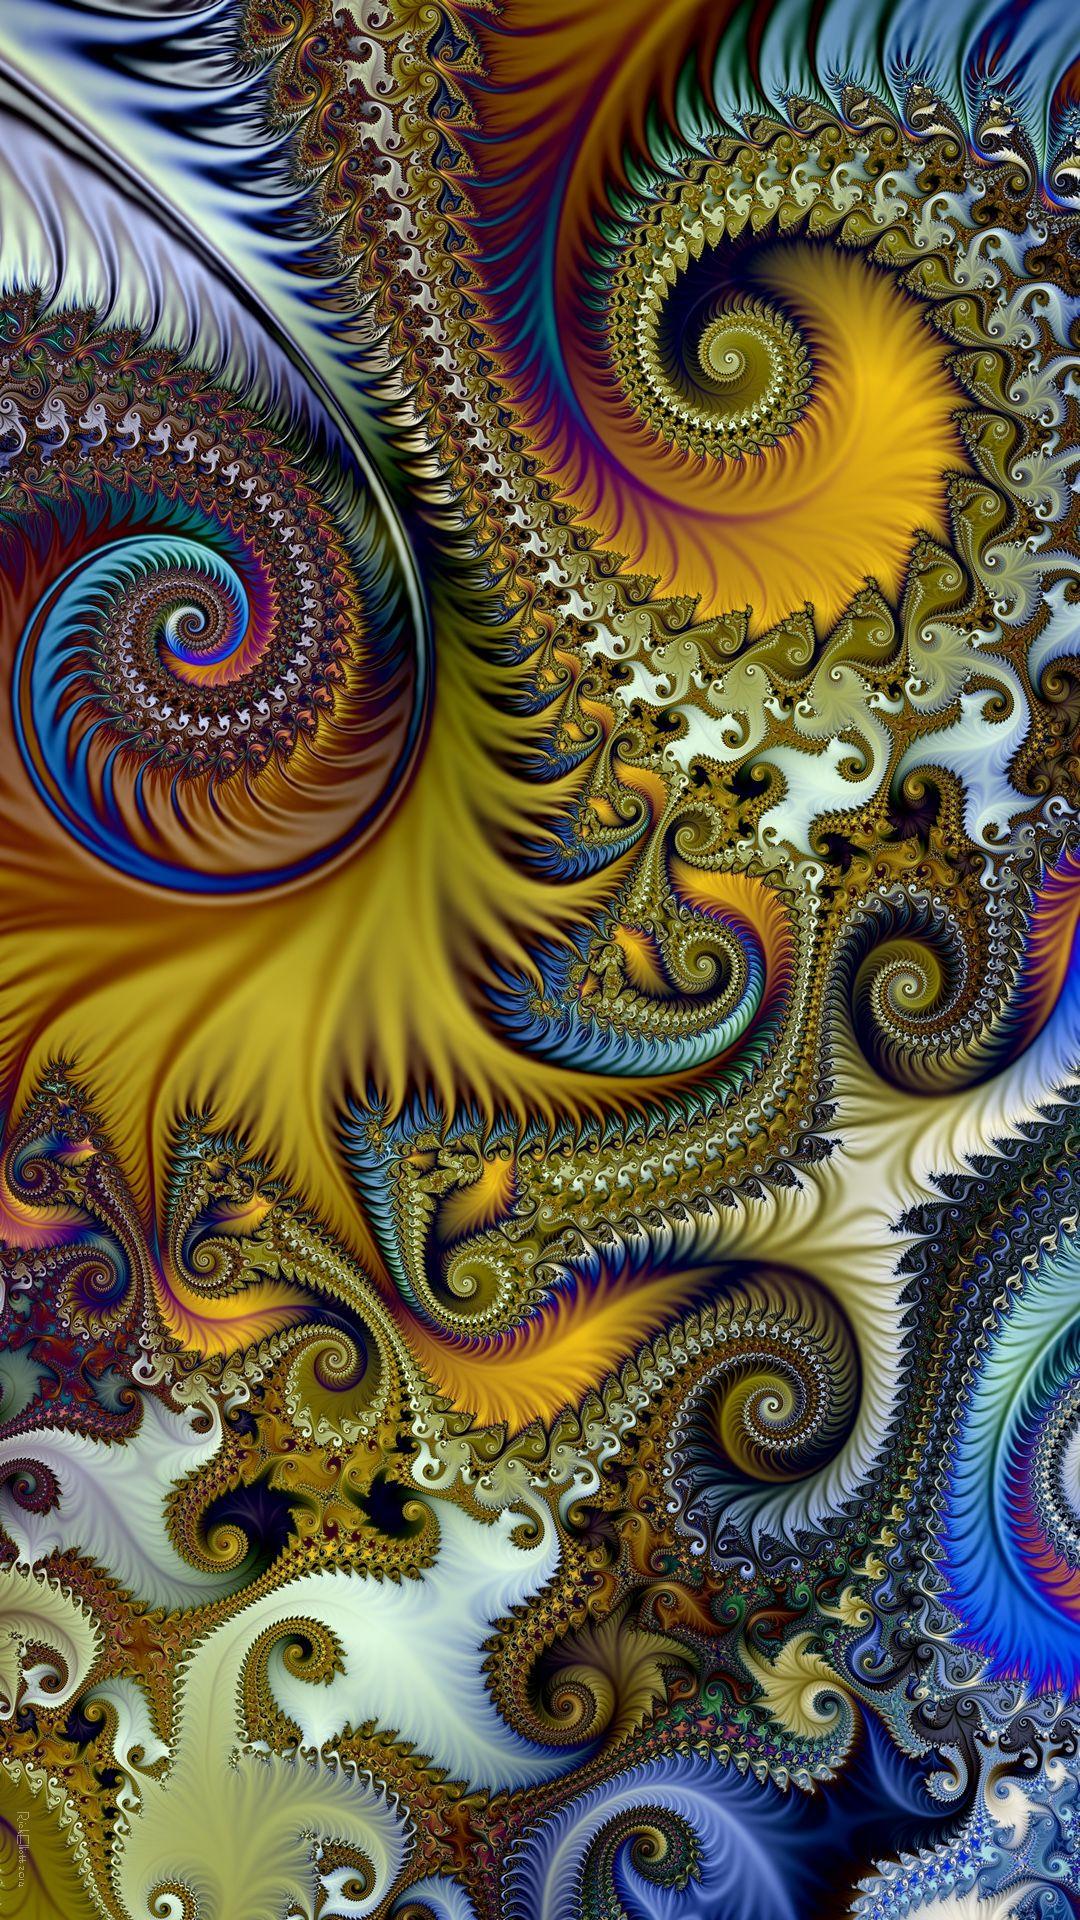 Feel Good Fractals Fractal Art Colorful Art Fractals